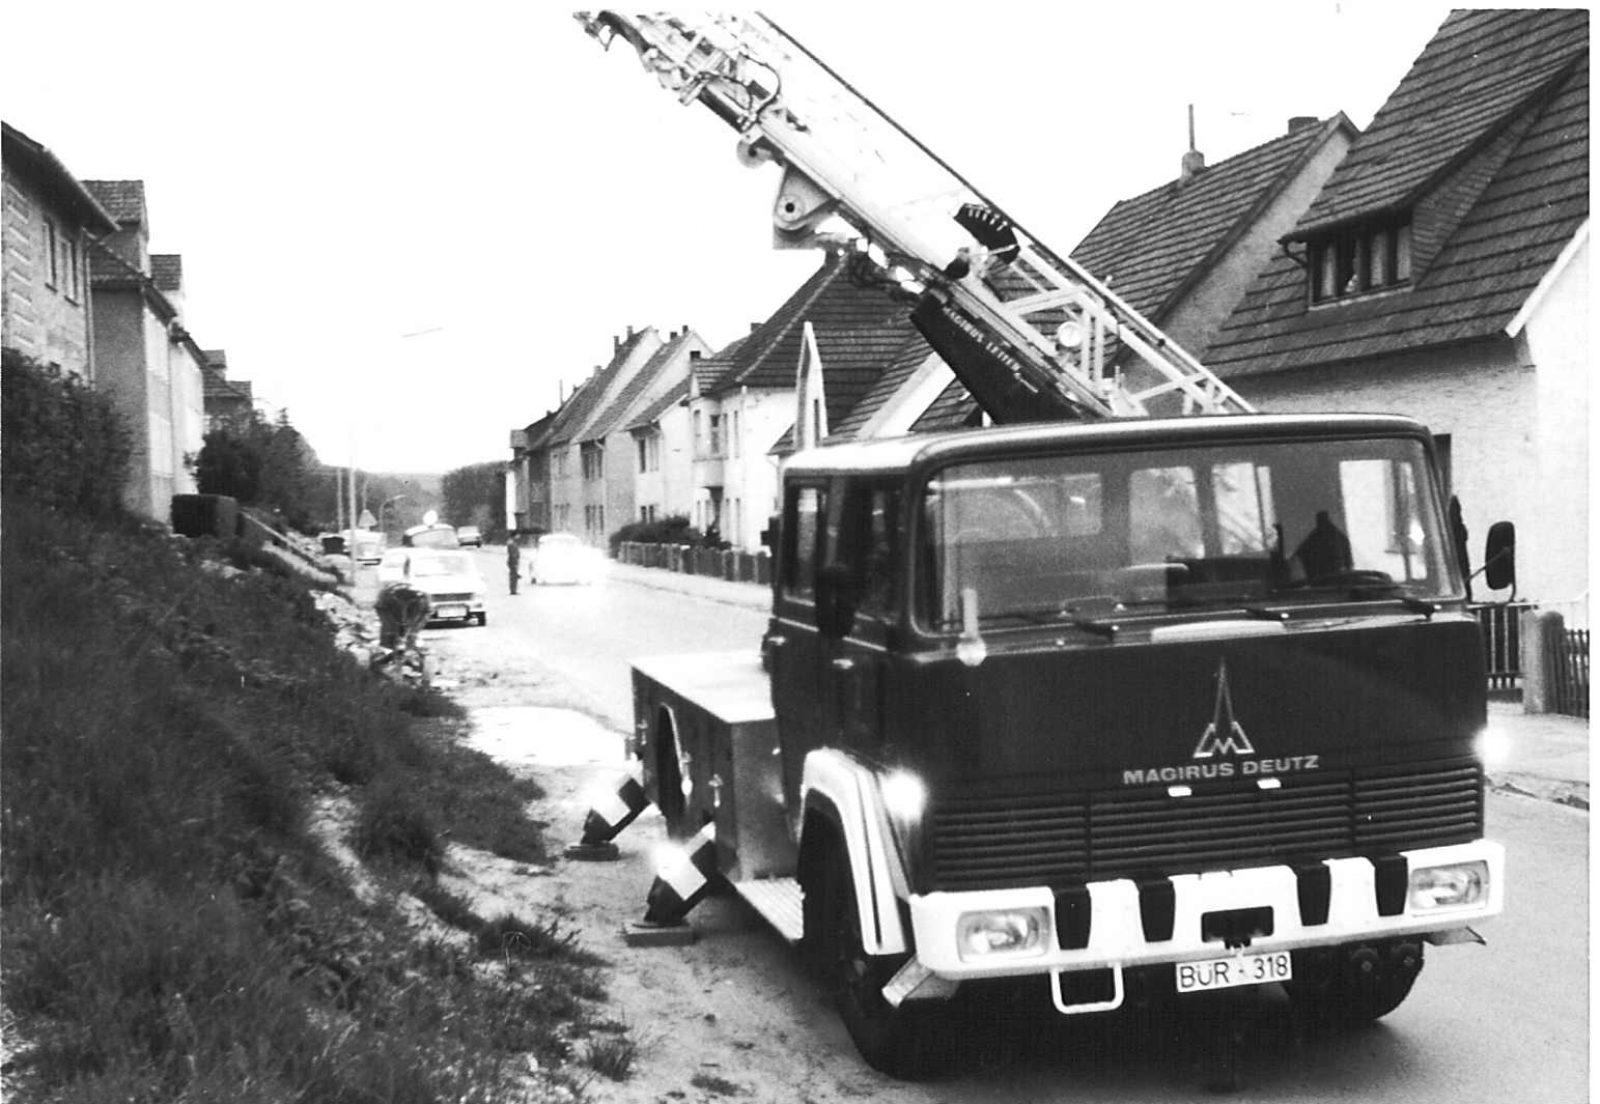 1972 Briloner Straße b1 fw